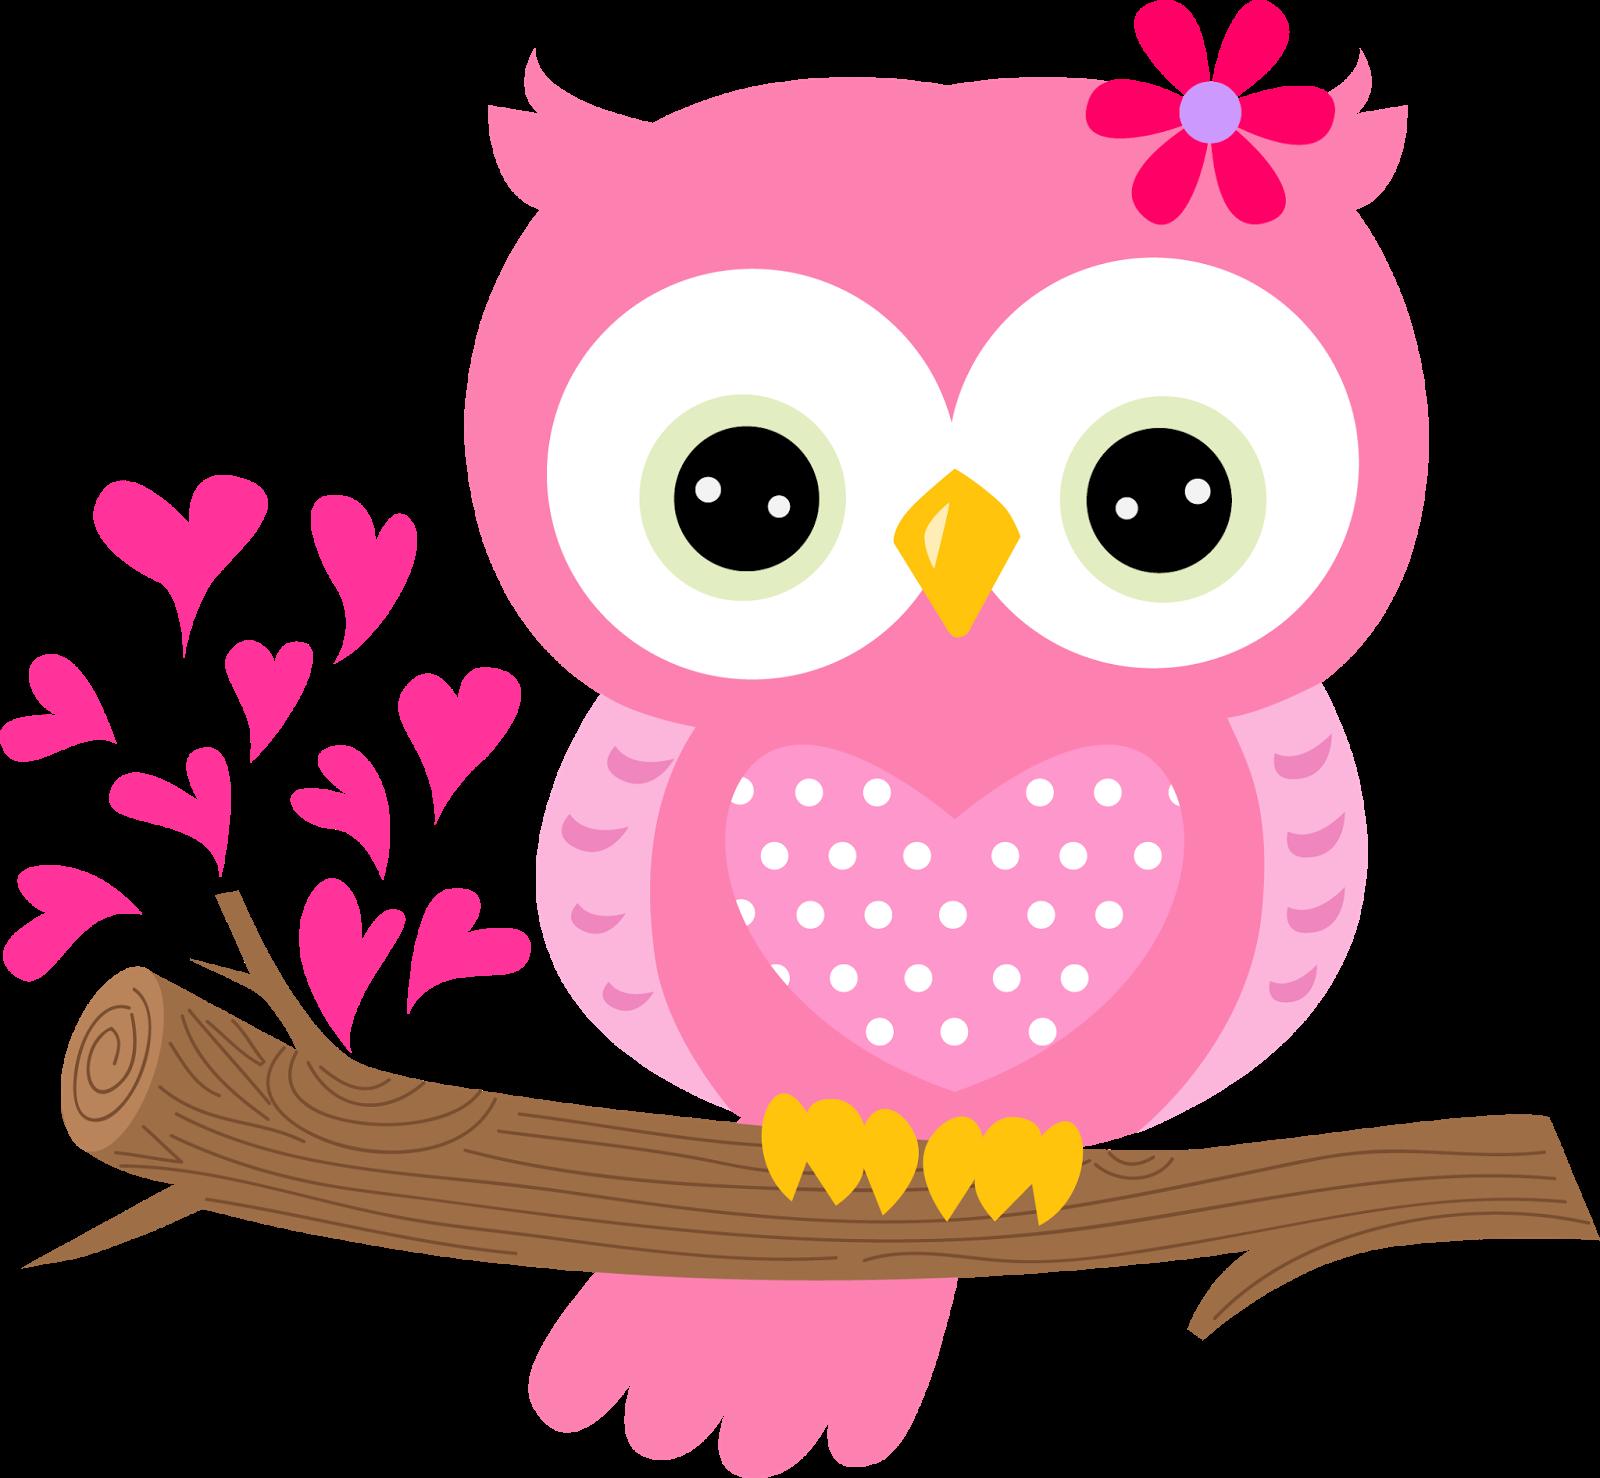 Baby owl clip art. Owls clipart pink